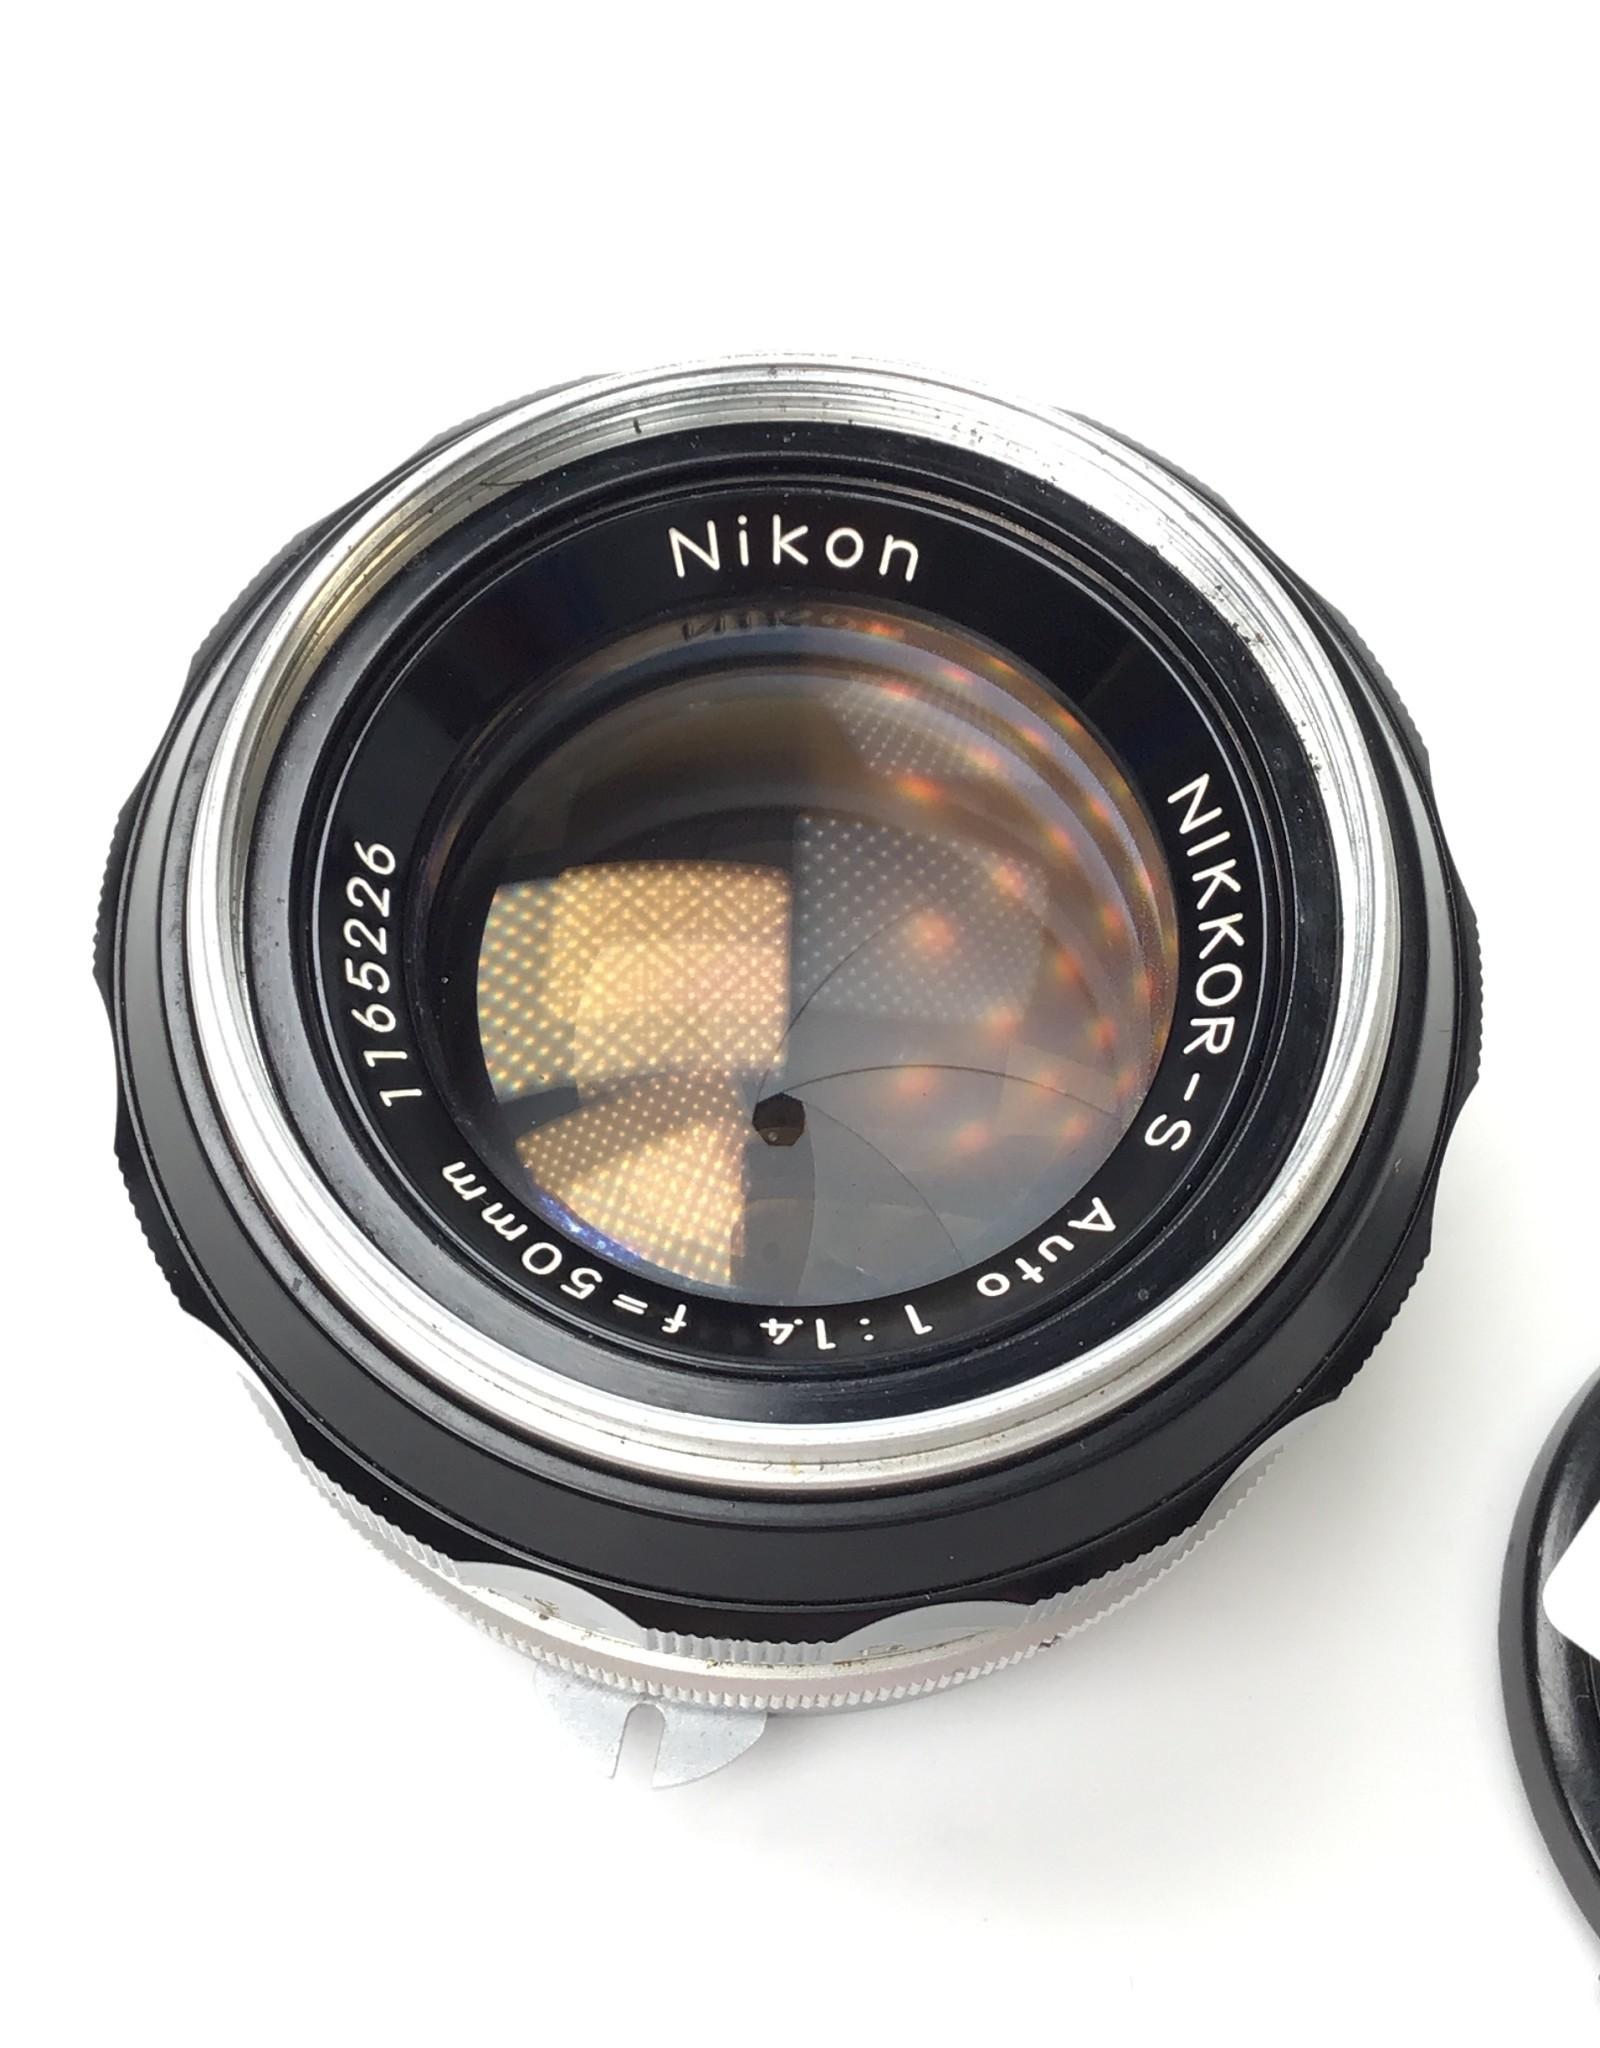 NIKON Nikon Nikkor-S 50mm f1.4 Non AI Lens Used Good